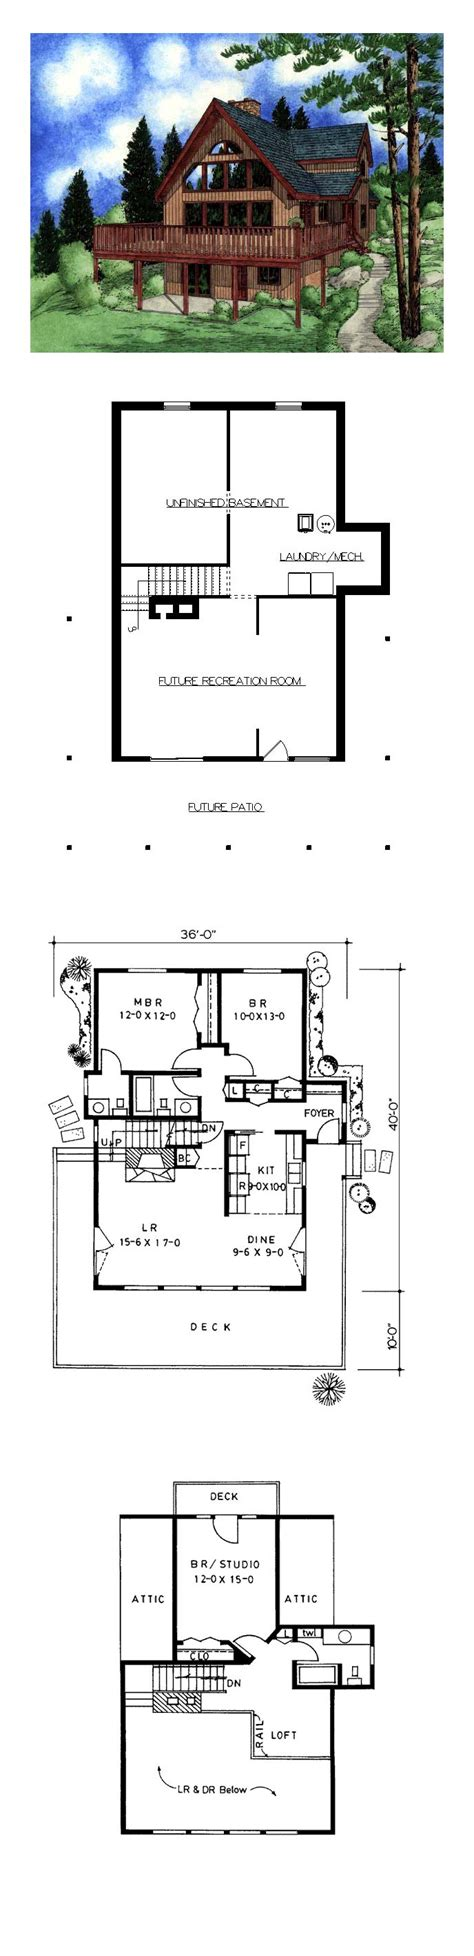 hillside floor plans the 49 best images about hillside home plans on